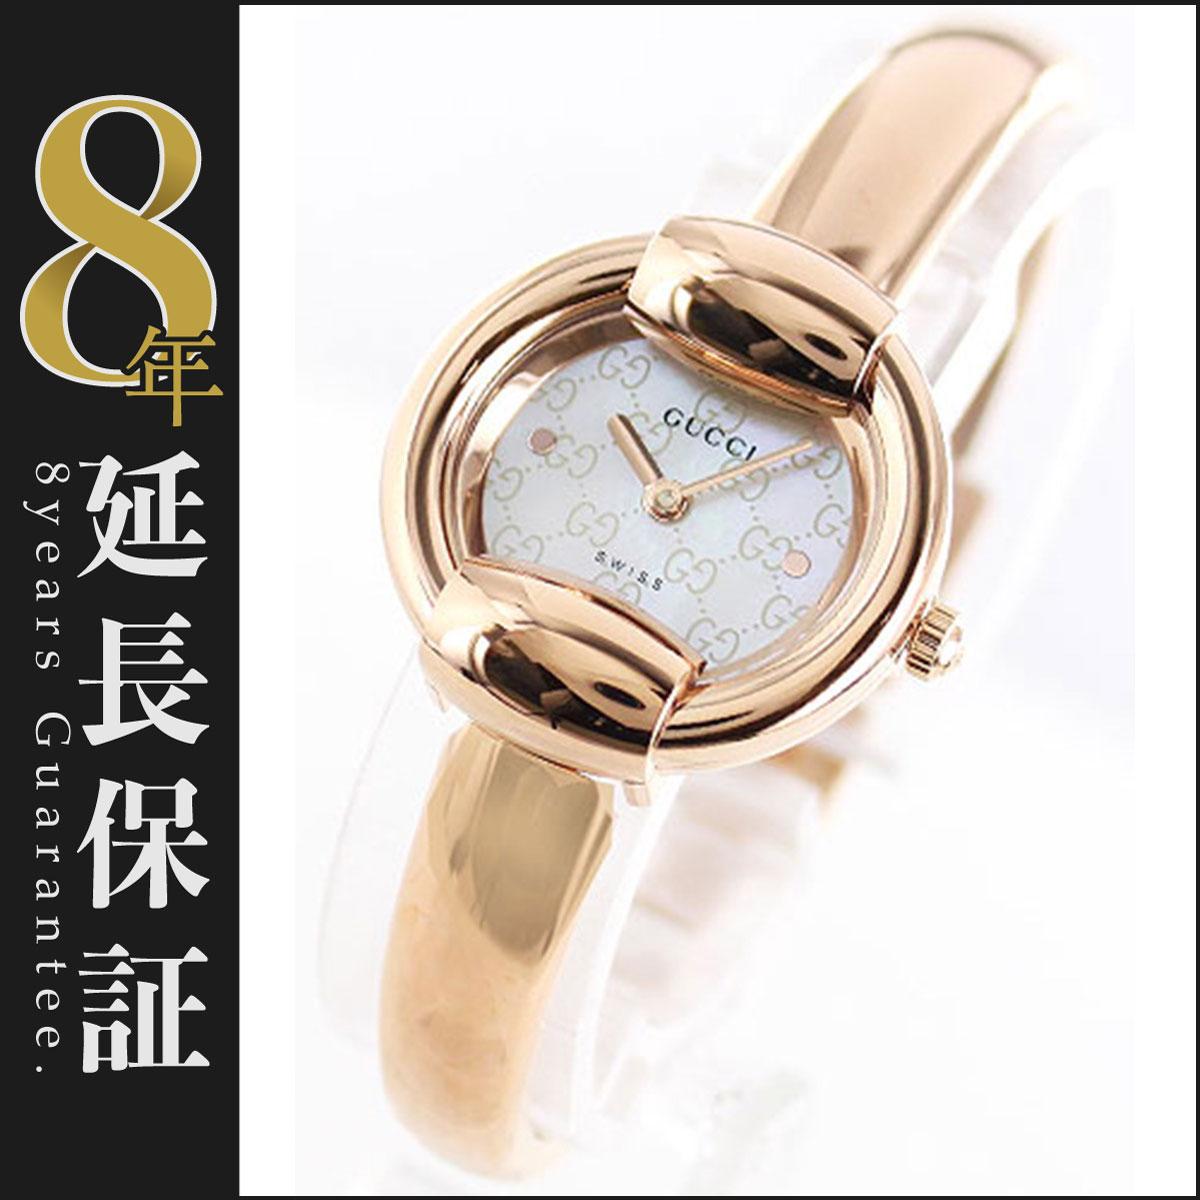 30b4b28aa300 (Gミラー) GUCCI YA067508 グッチ バングルウォッチ ブラック レディース腕時計